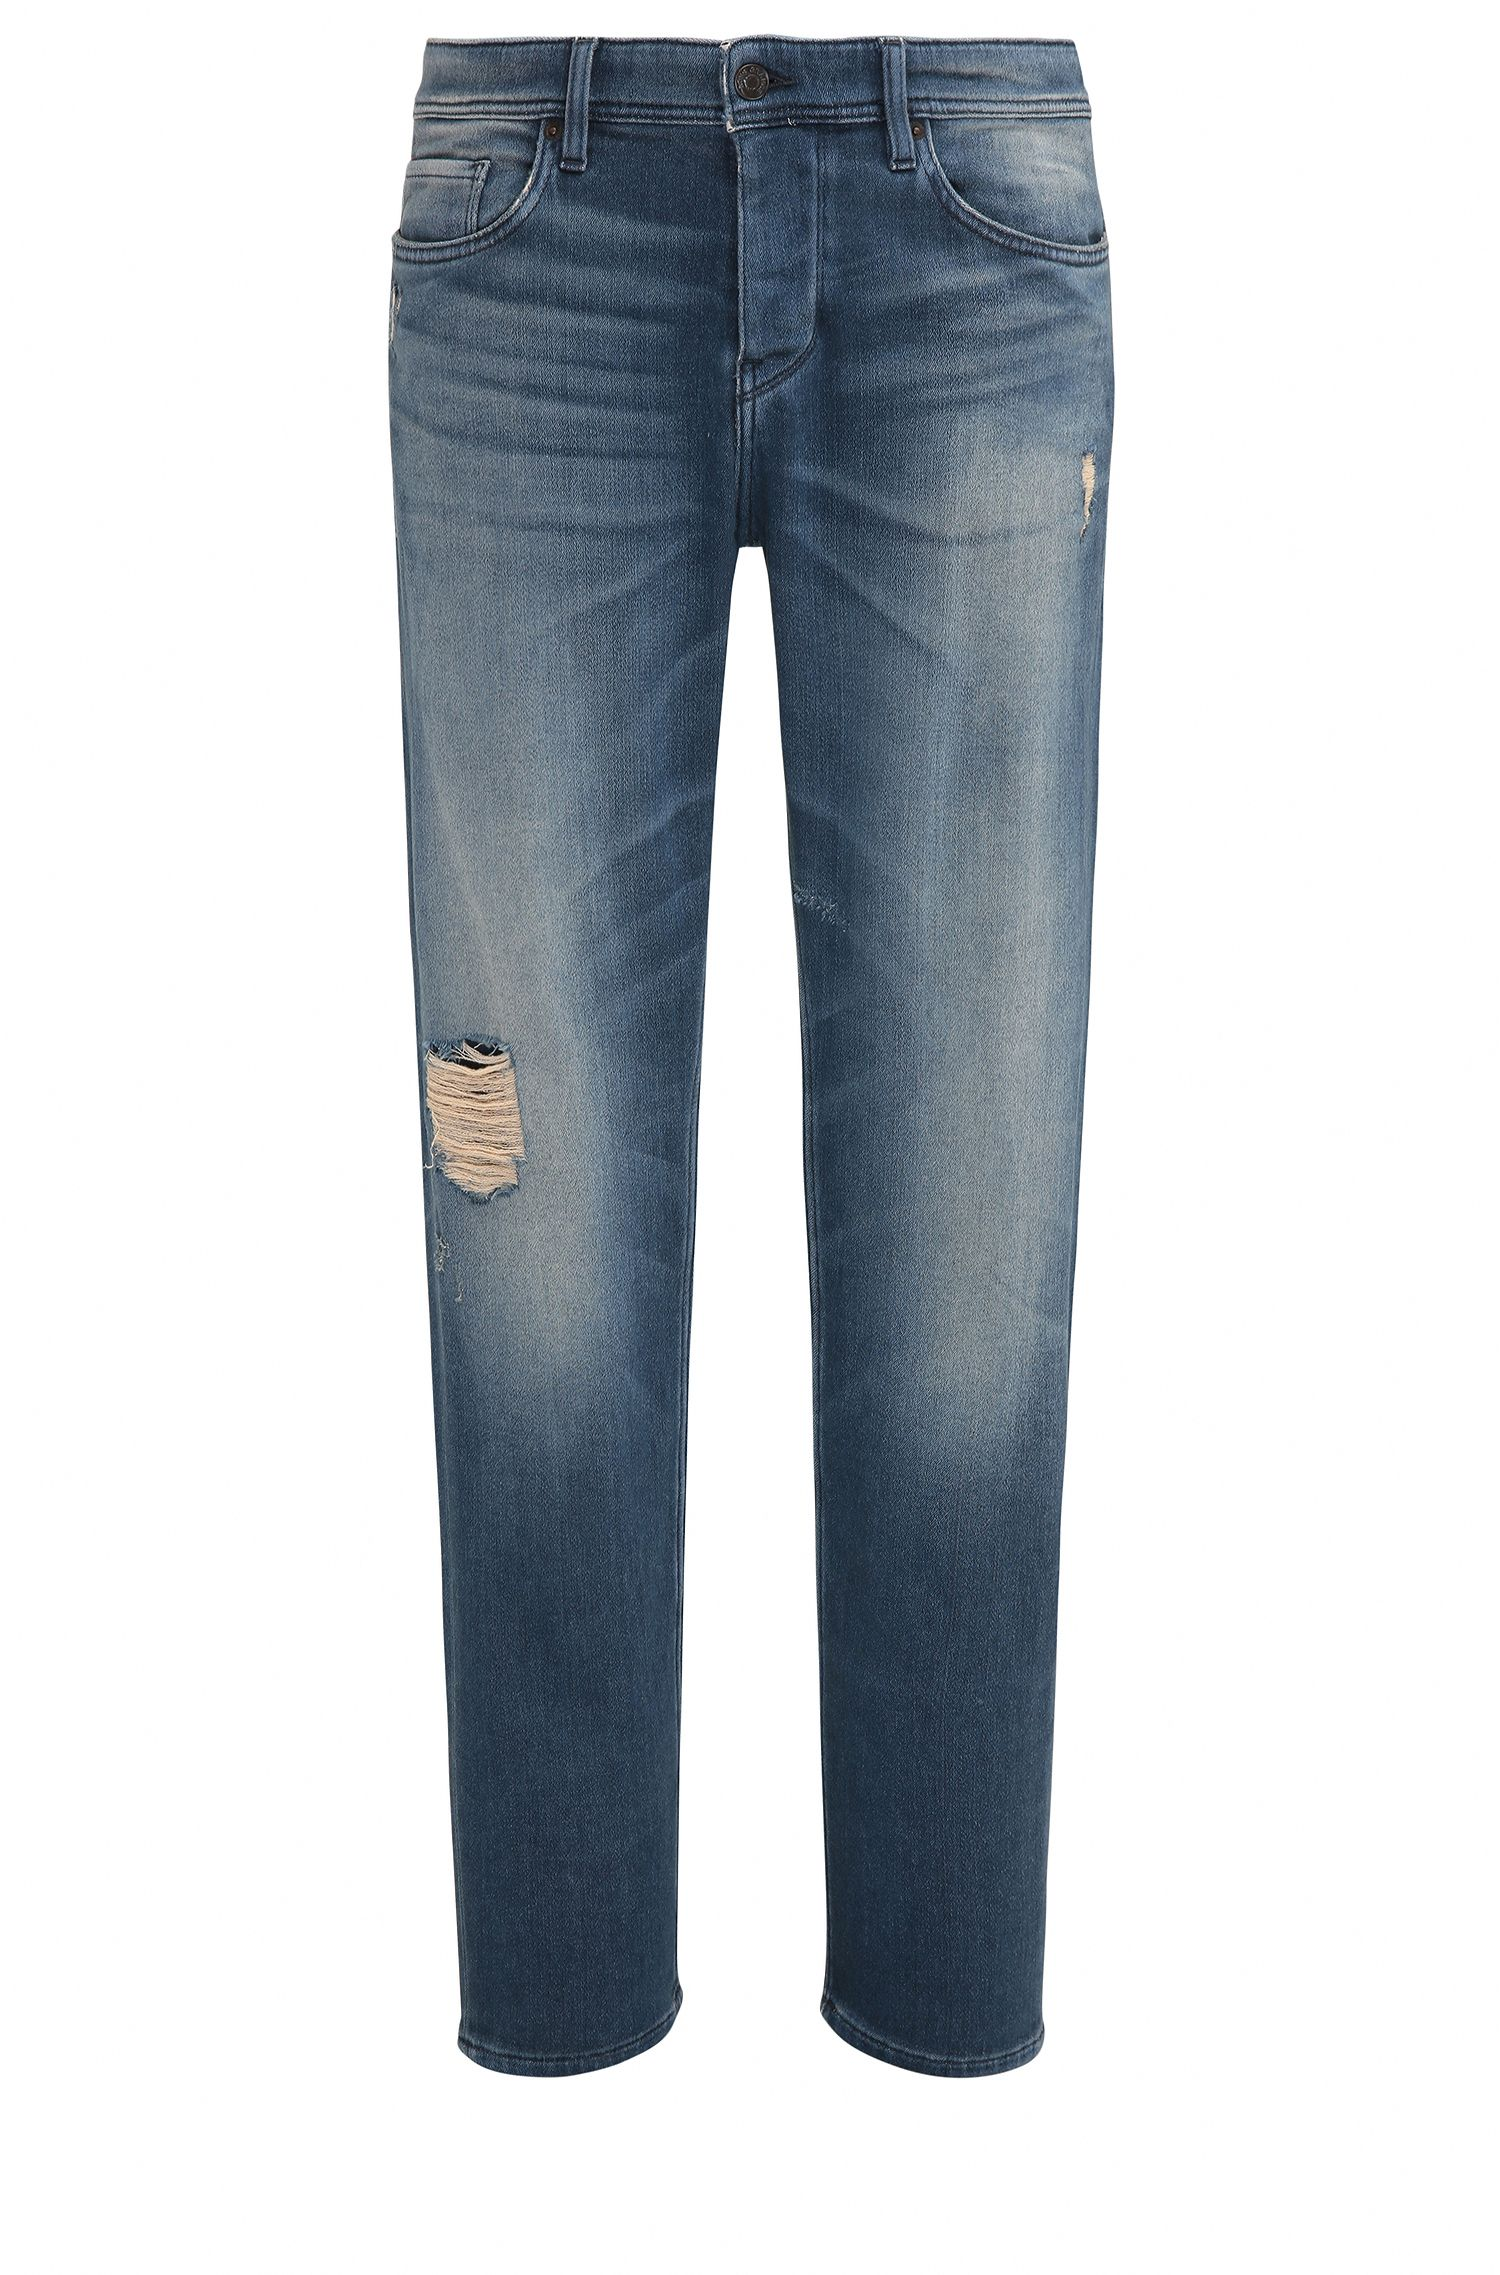 Distressed Stretch Cotton Jeans, Taper Fit   Orange90